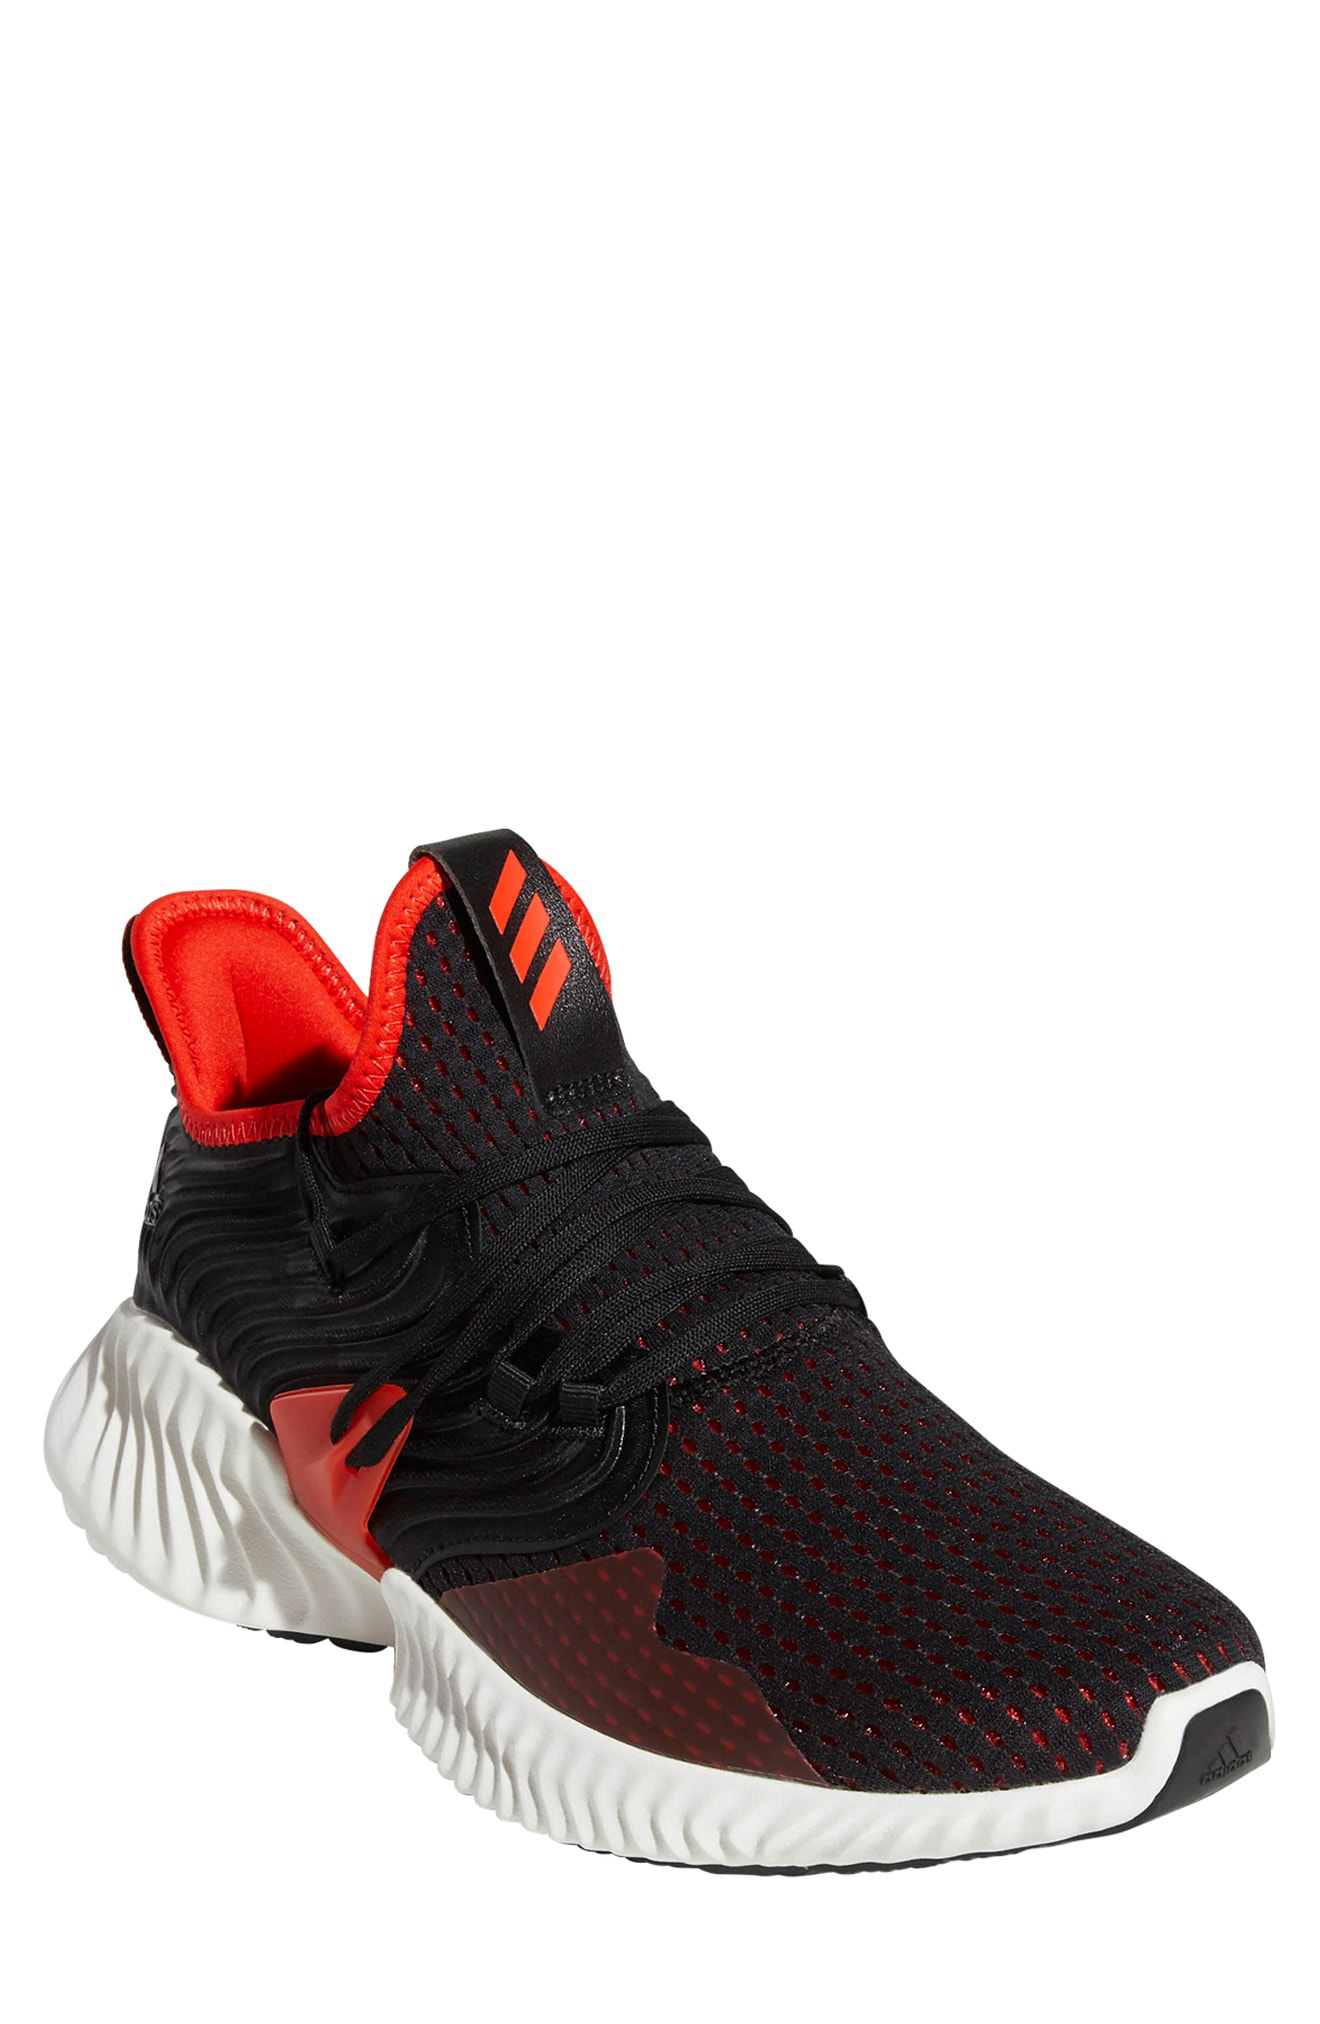 87681cf65 Adidas Originals Alphabounce Instinct Running Shoe In Core Black  Active Red